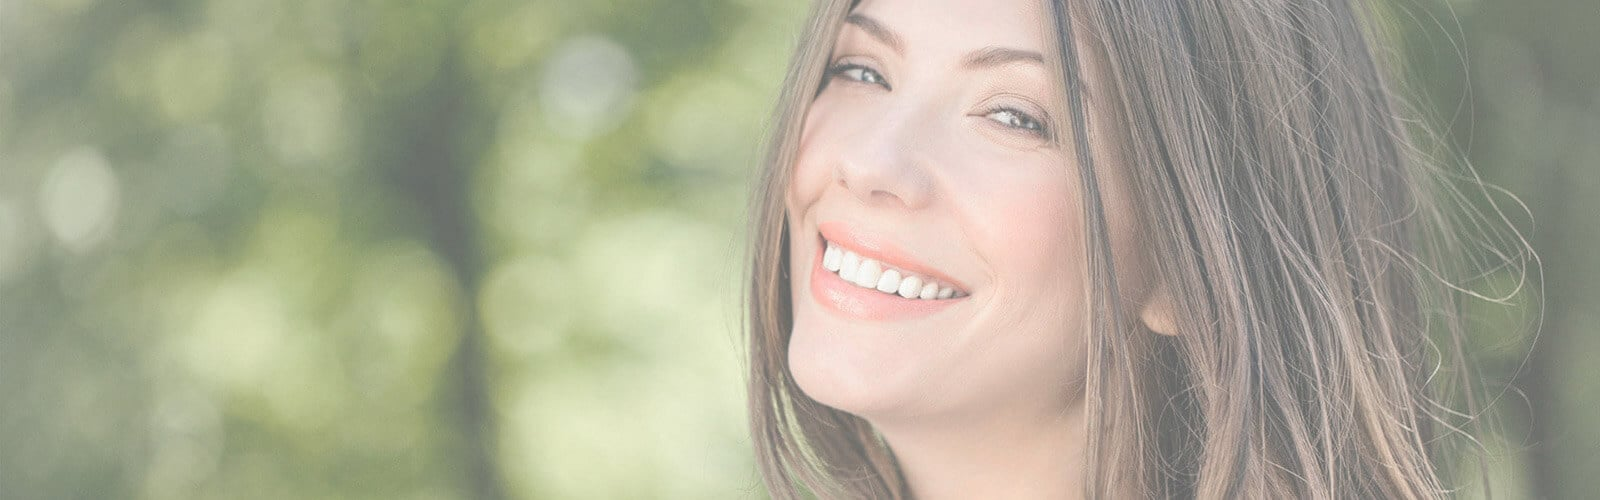 Pitt Meadows Dentist   Your Family Dentist